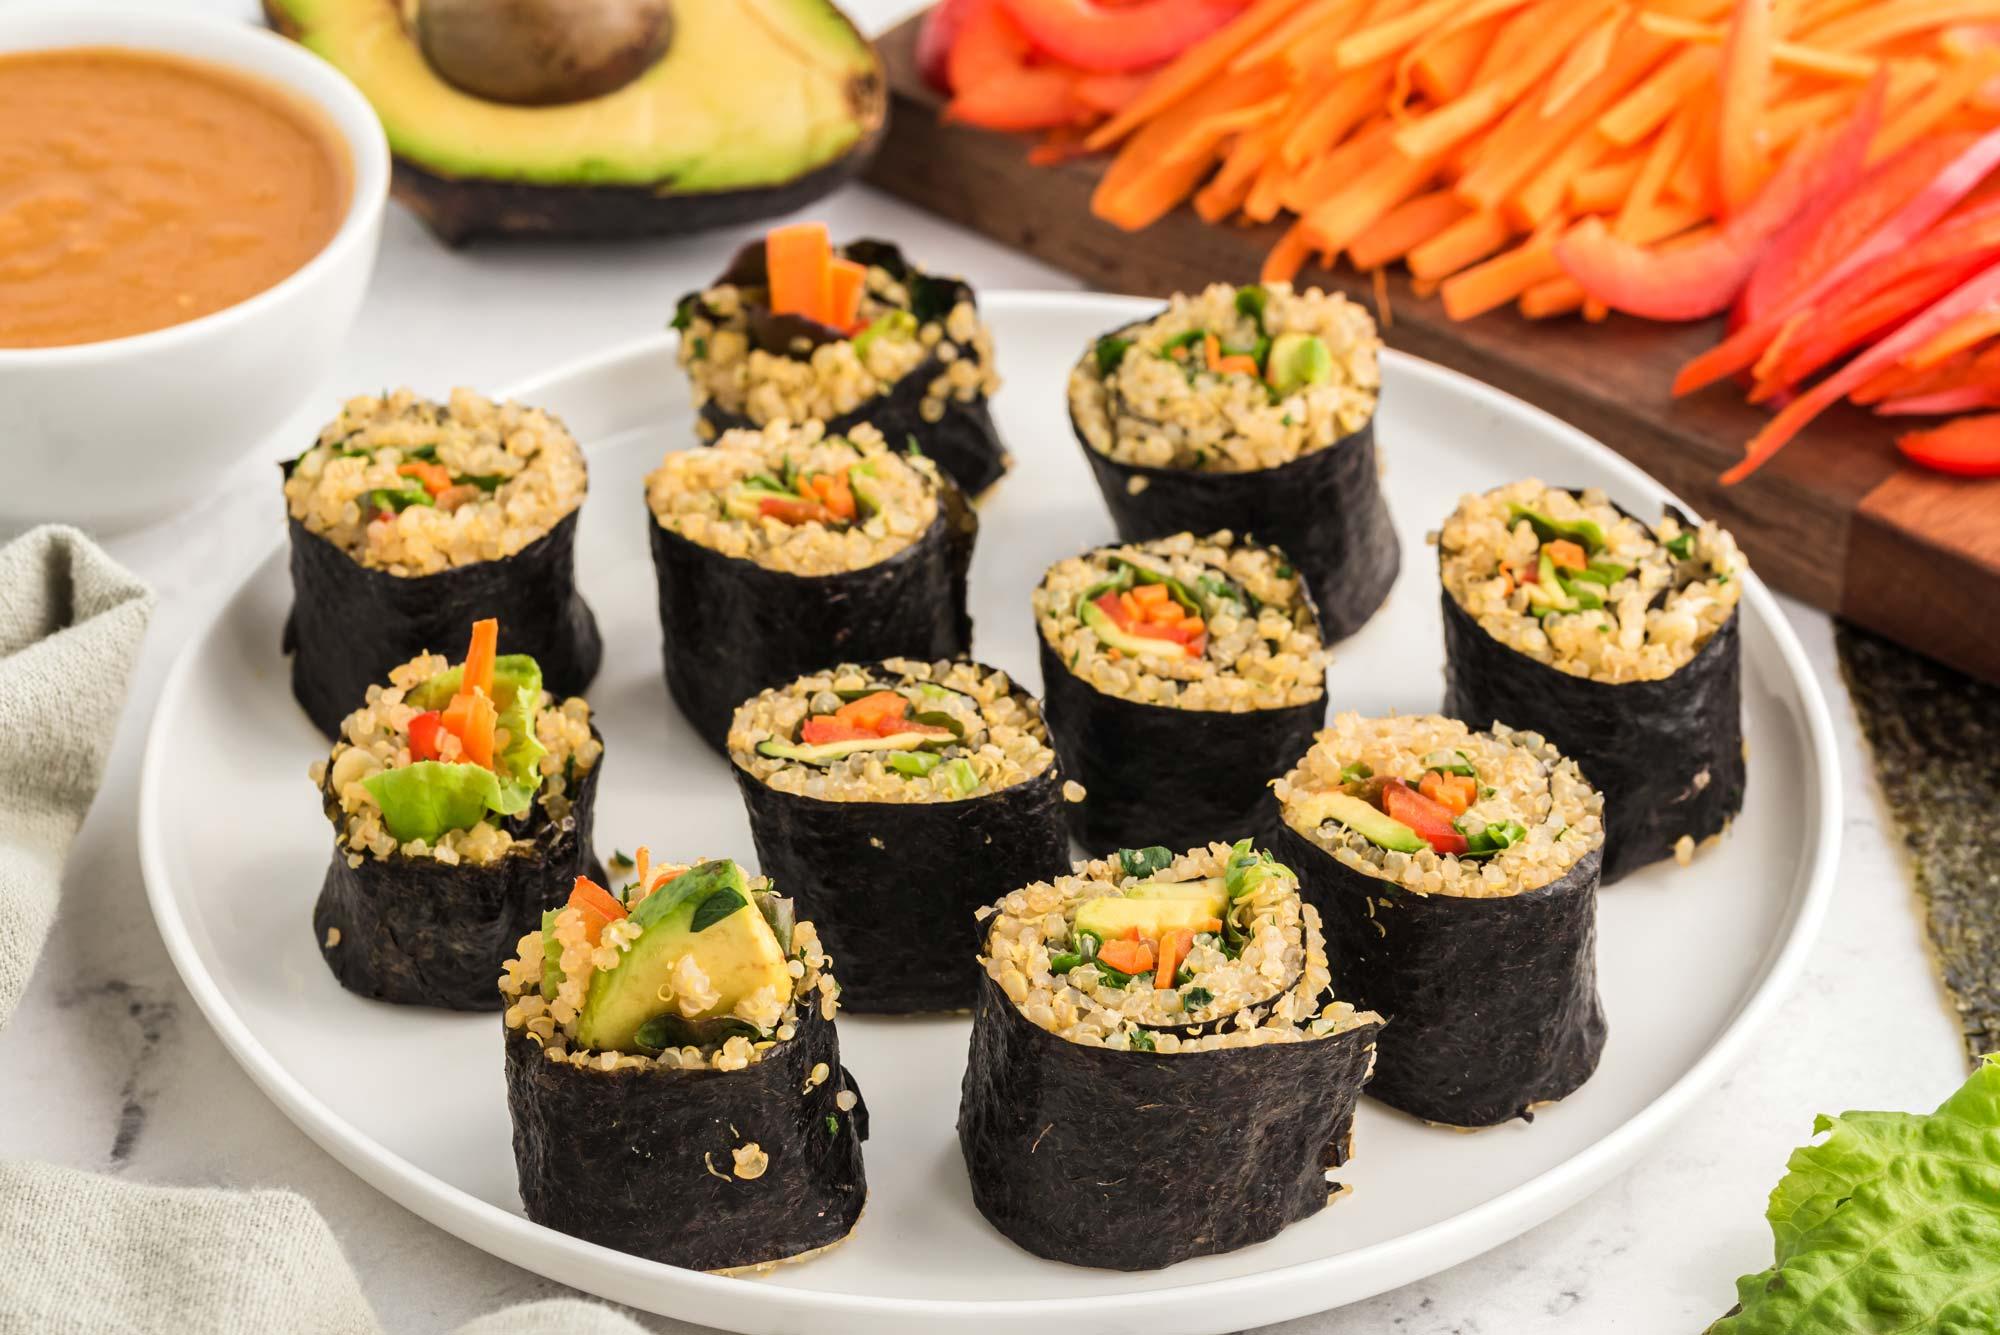 rainbow millet roll with miso peanut sauce on plate